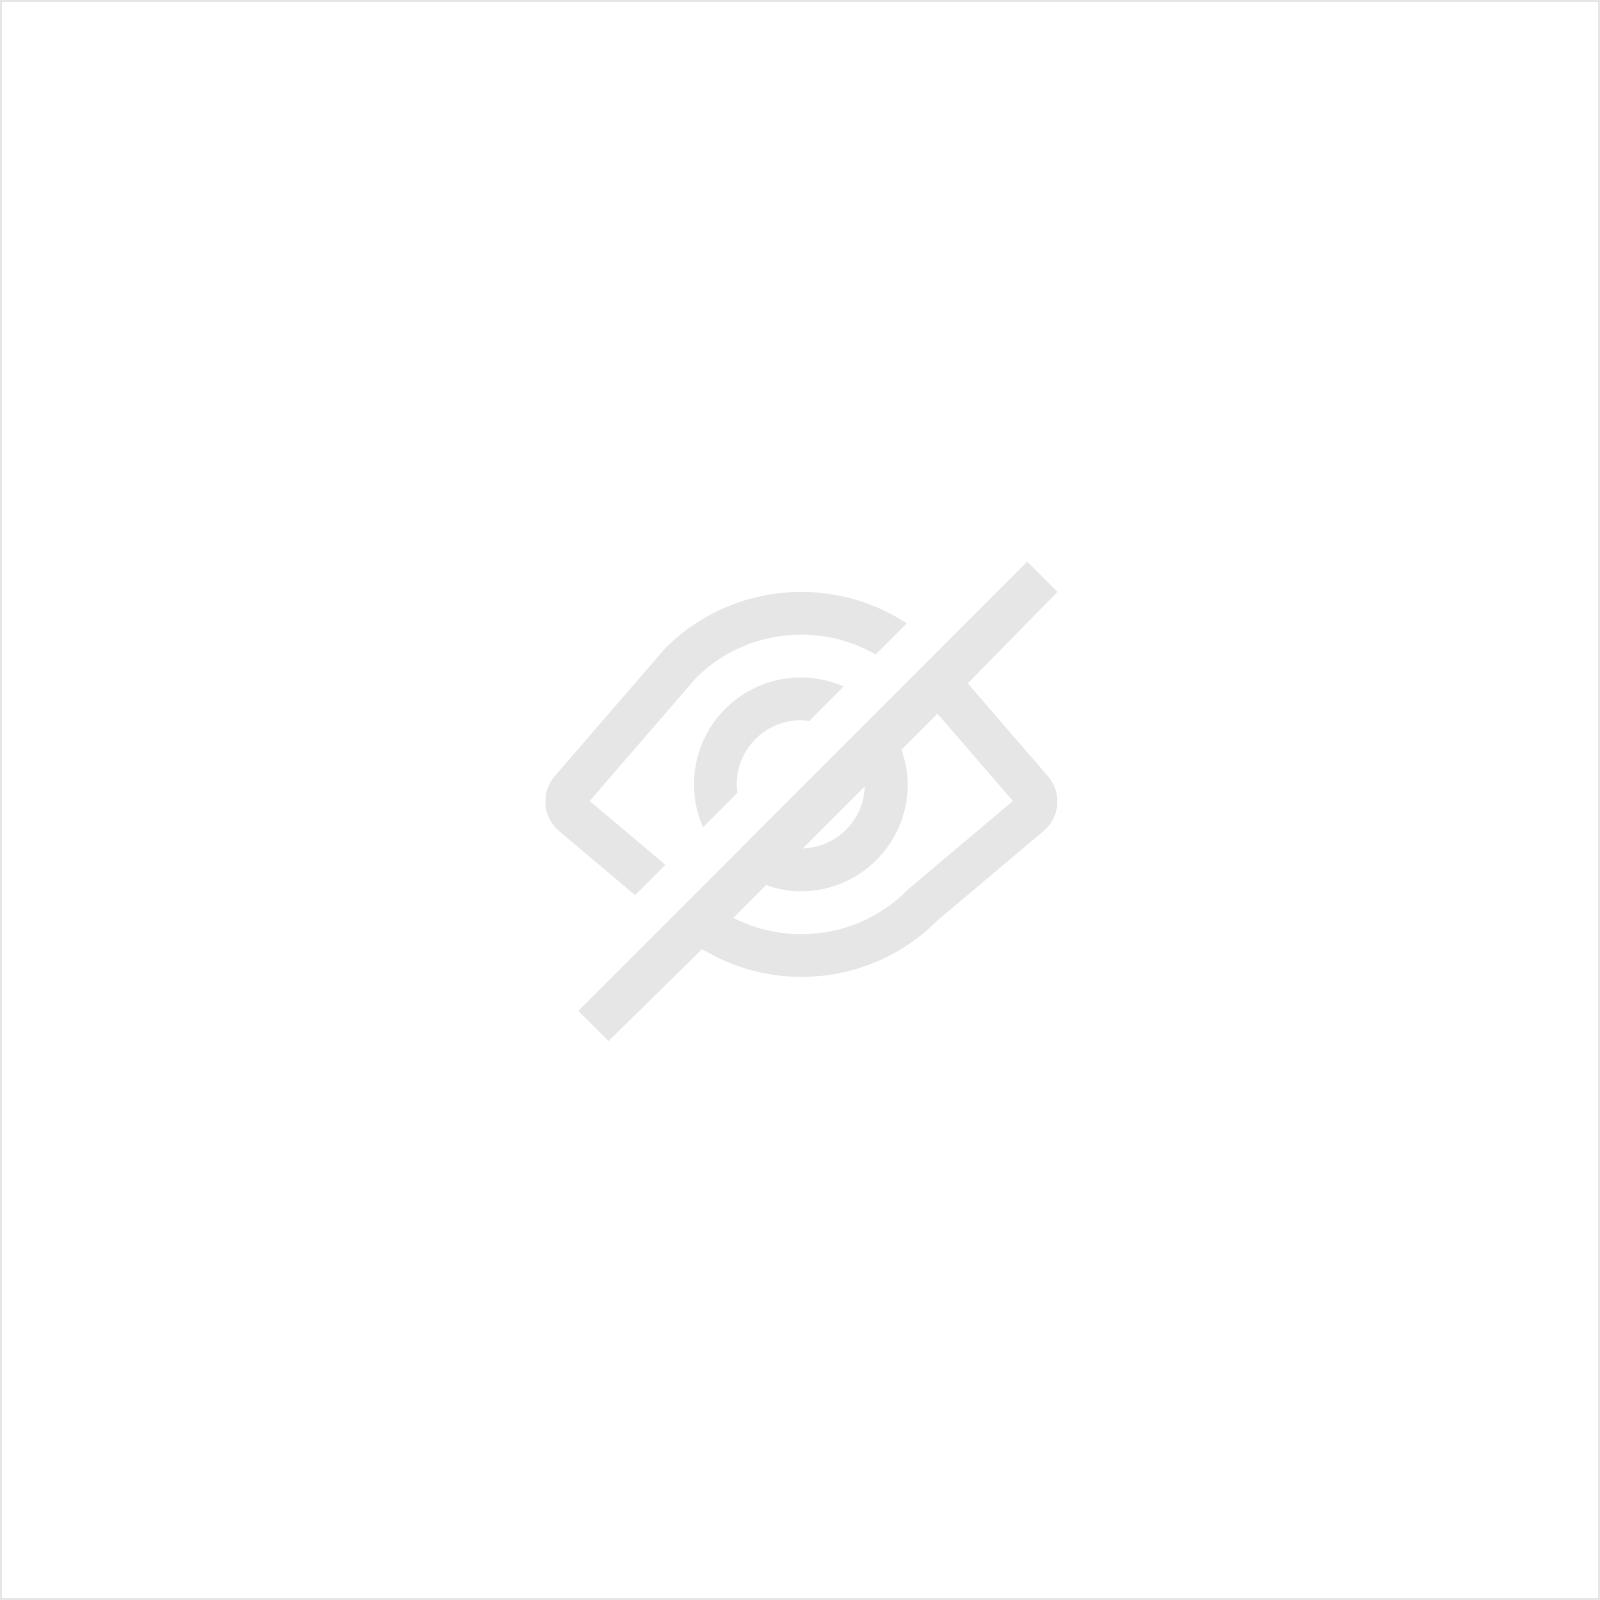 MEGUIAR'S SUPREME DRYING TOWEL 55 X 75 CM (X1802)